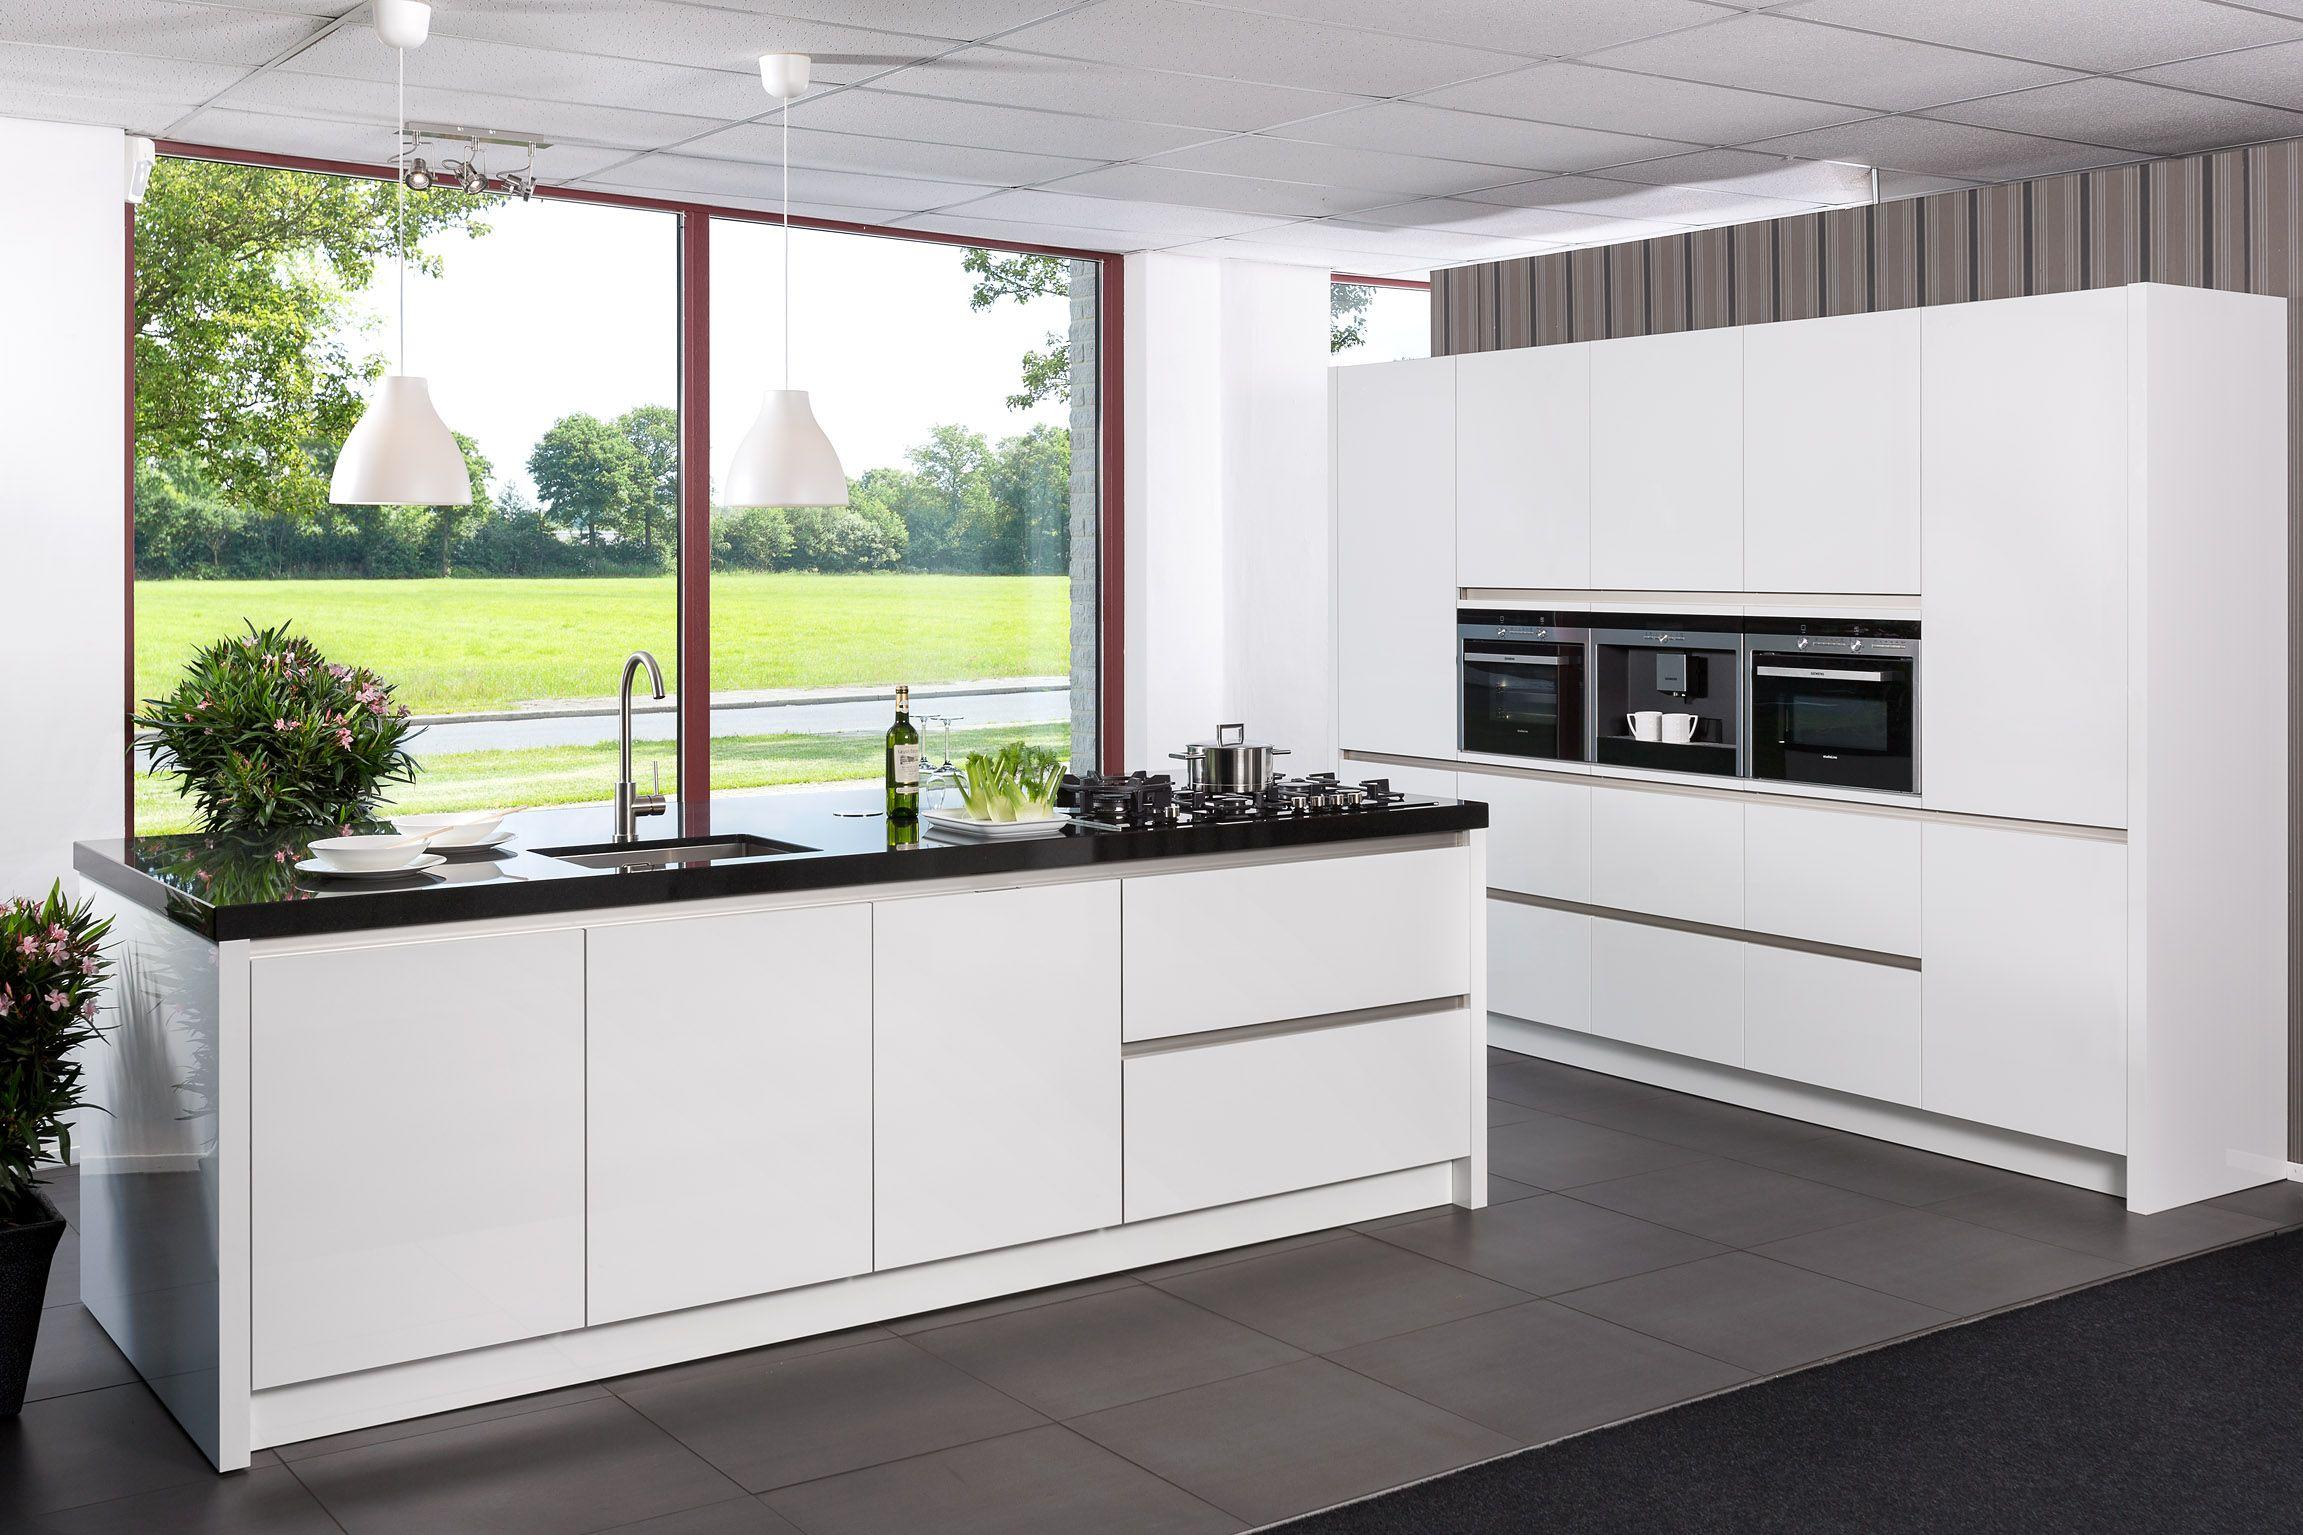 Siemens Keukens Nederland : Keukens greeploze siemens keuken